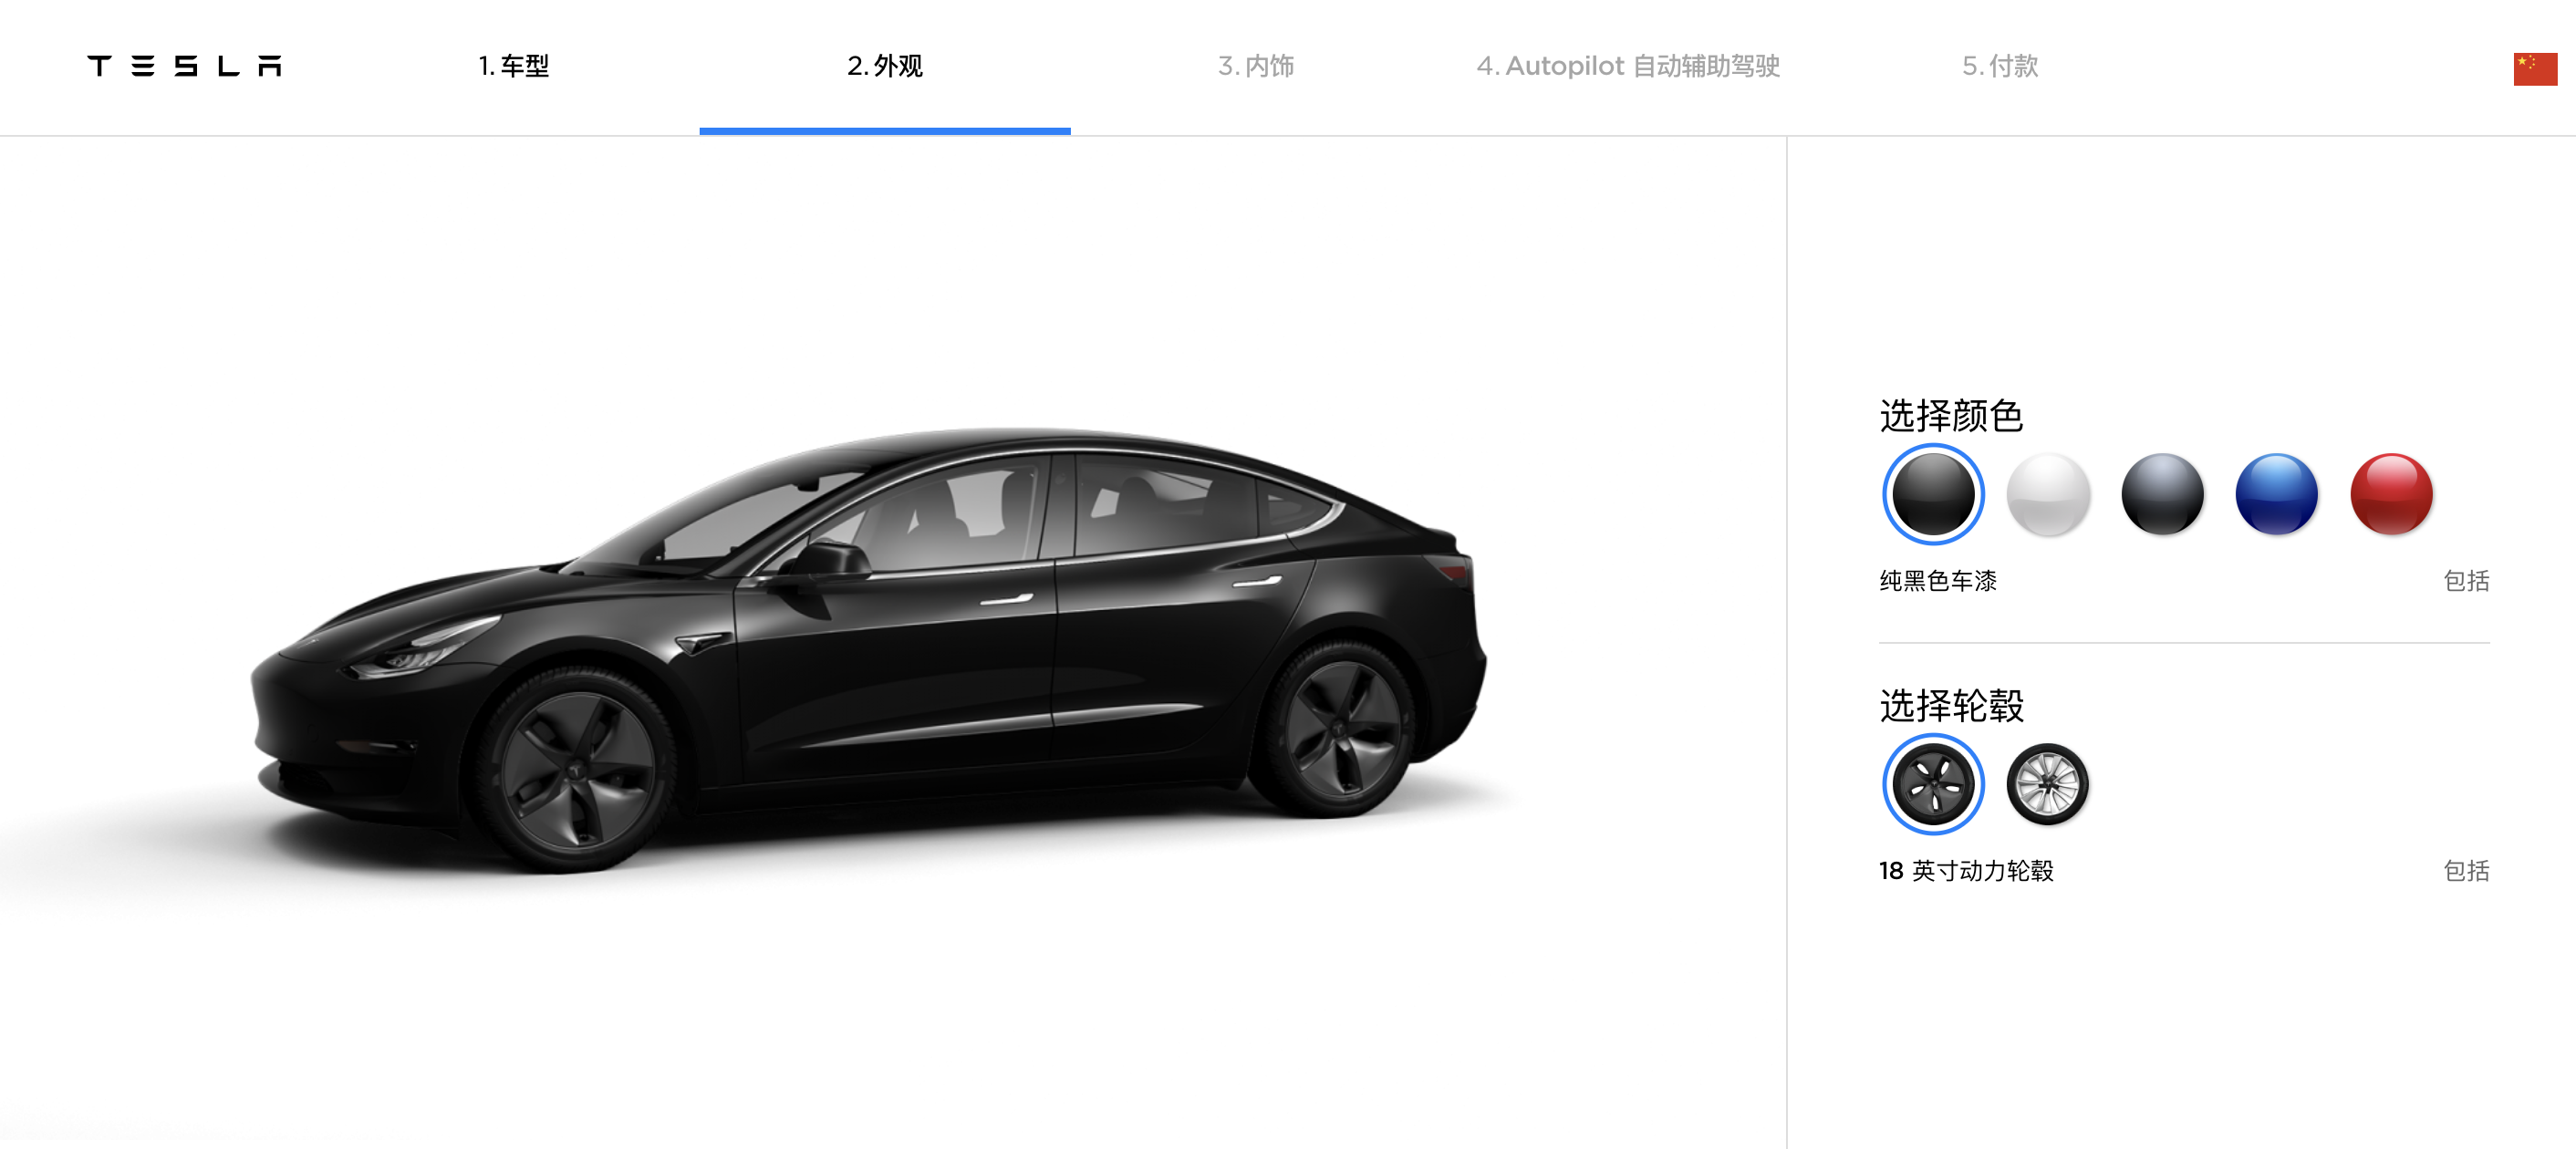 Model 3免费车漆换为黑色